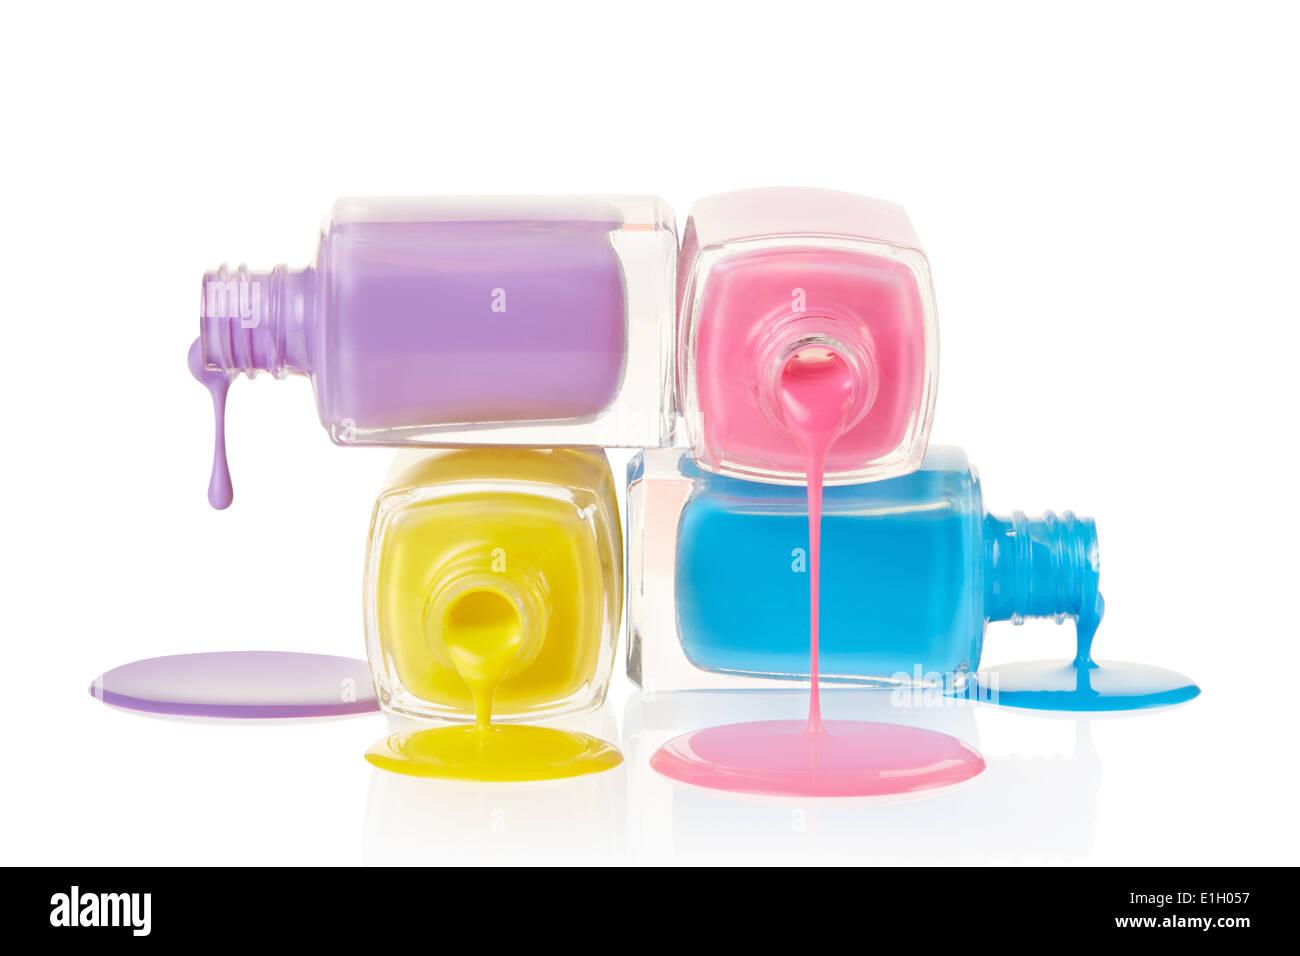 Nail polish stack spilled Stock Photo: 69829459 - Alamy